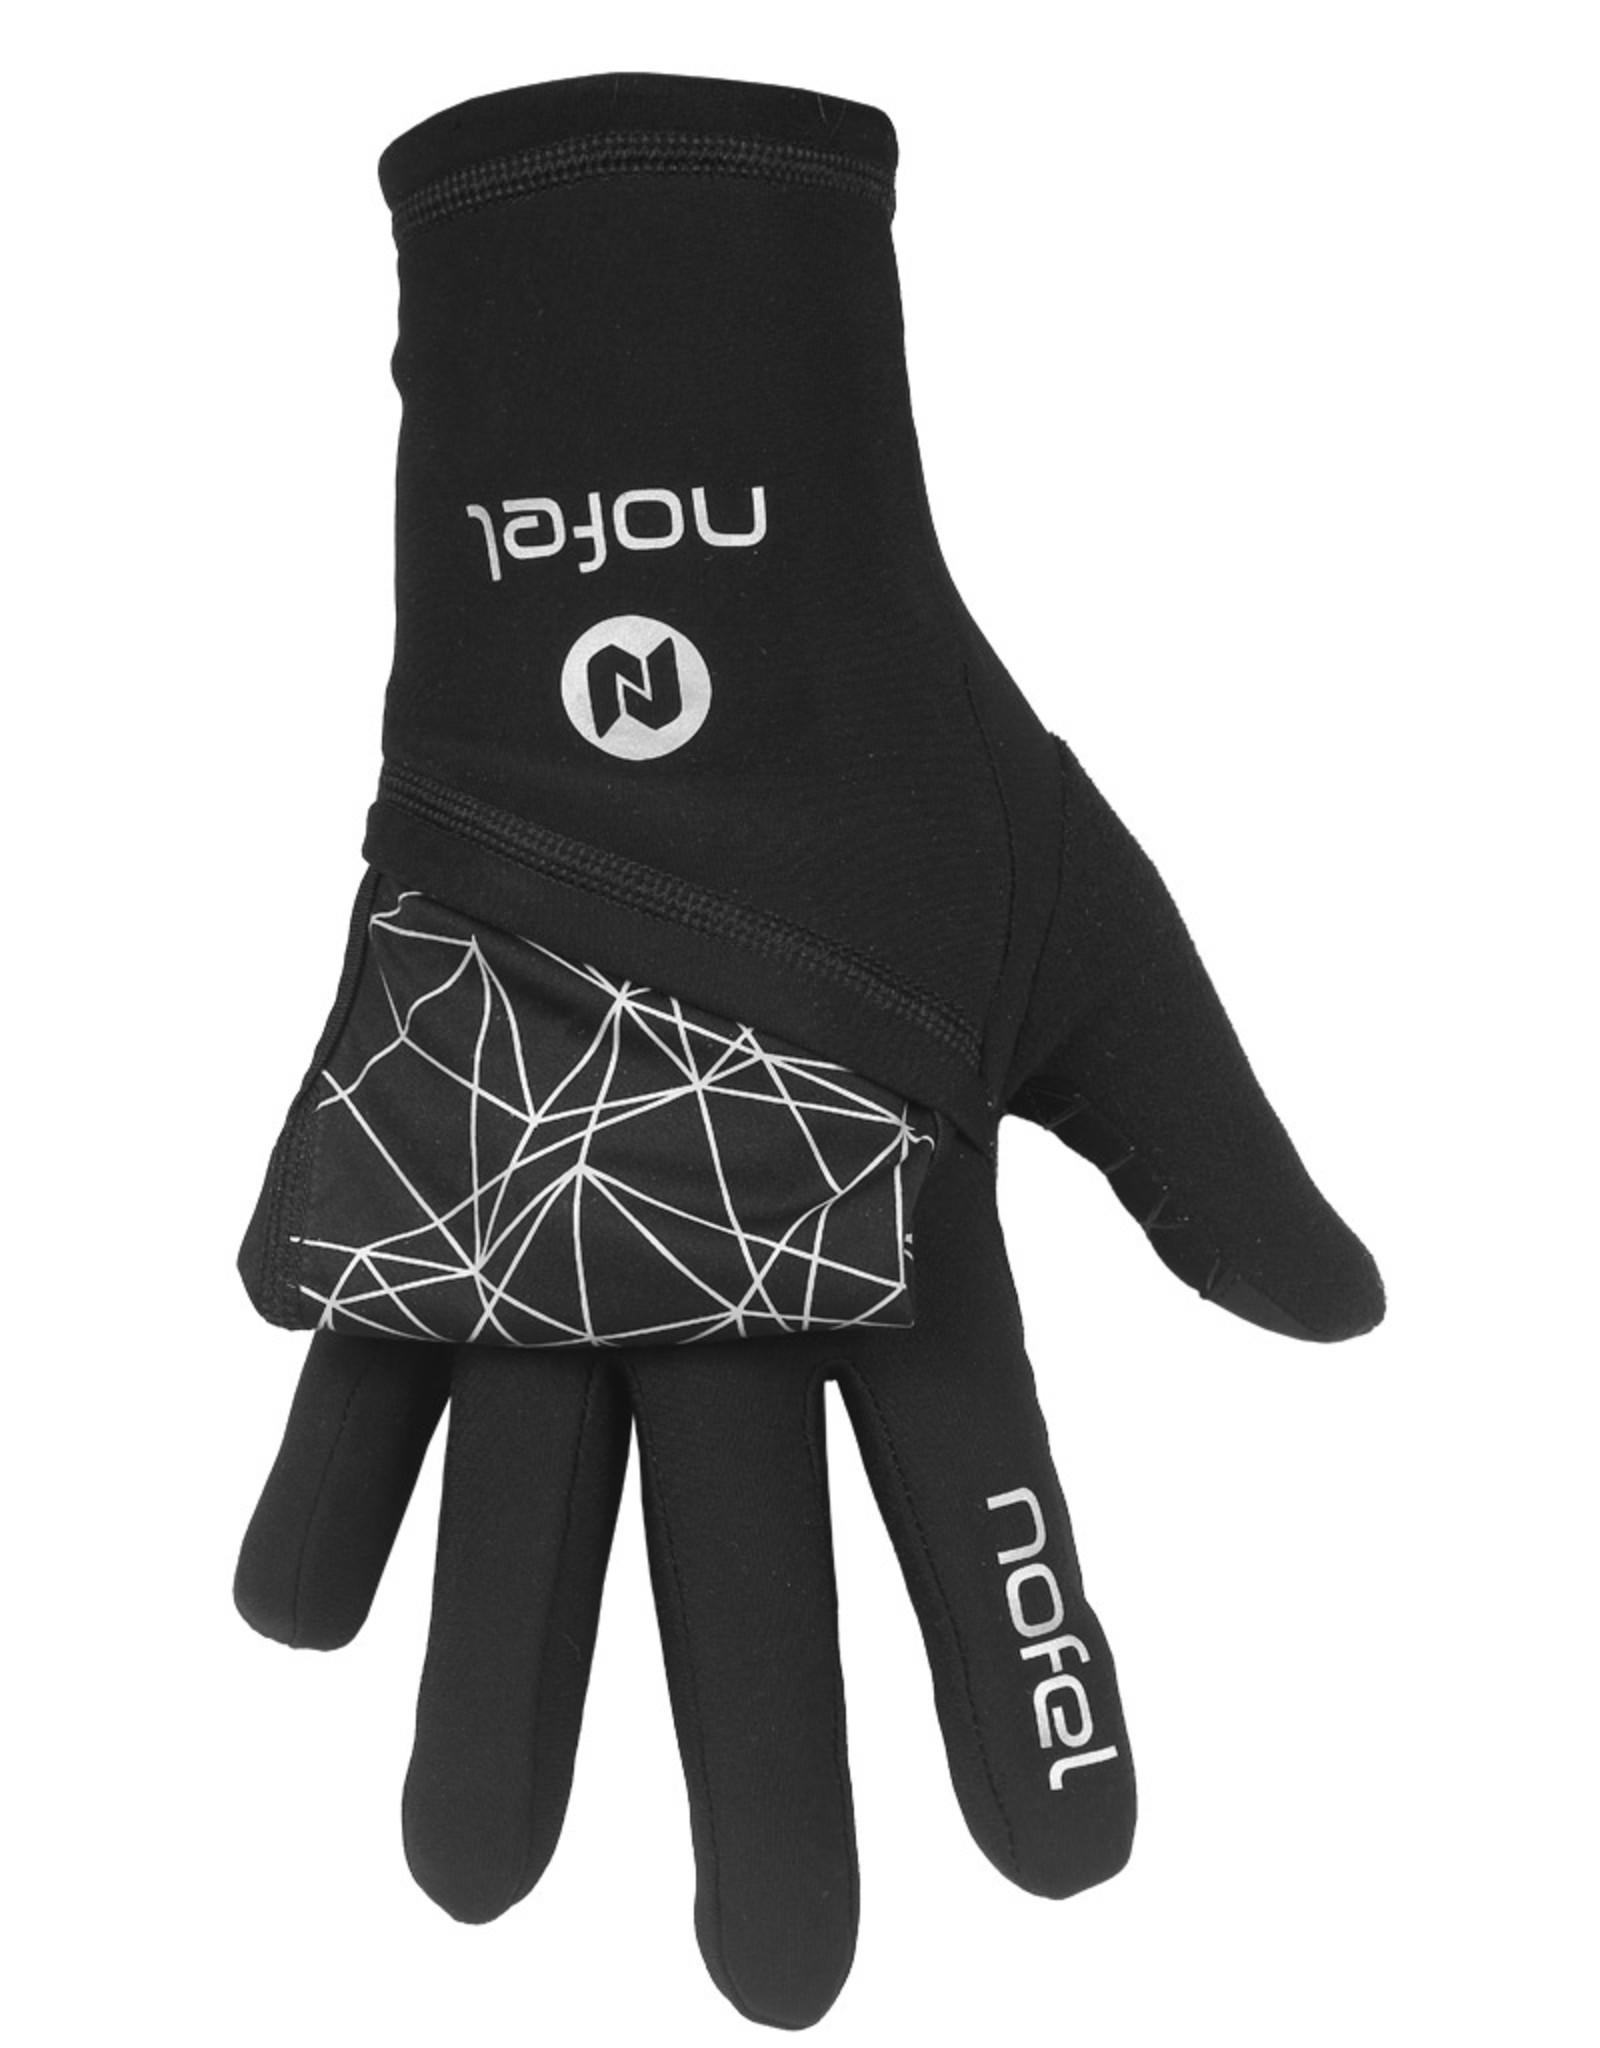 NOFEL Classic Converter Glove